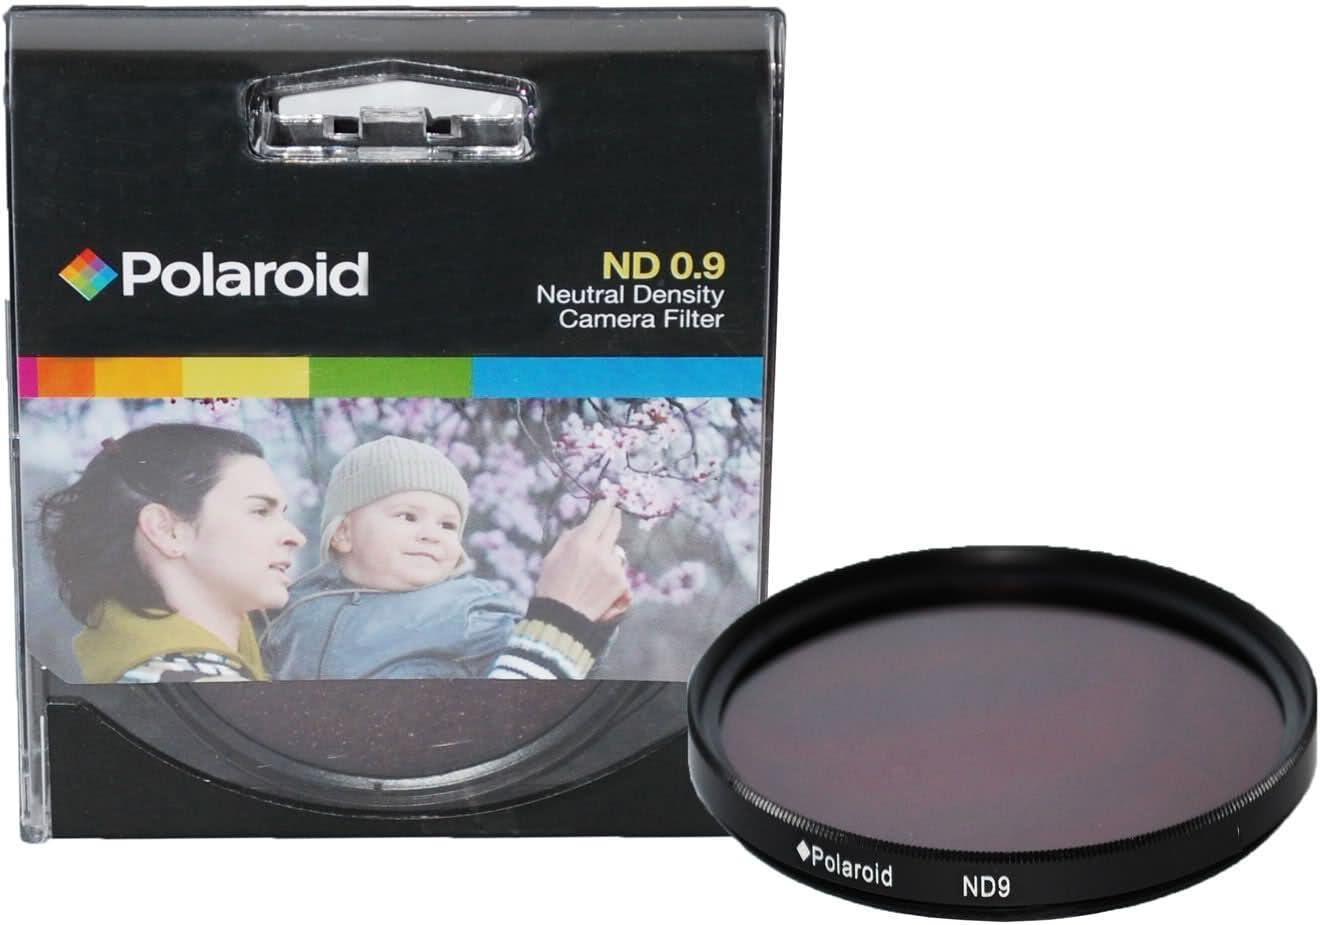 Polaroid Optics ND 0.9 Neutral Density Filter for The Sony NEX-VG10 NEX-VG20 Handyman Camcorder with 18-200mm Lens